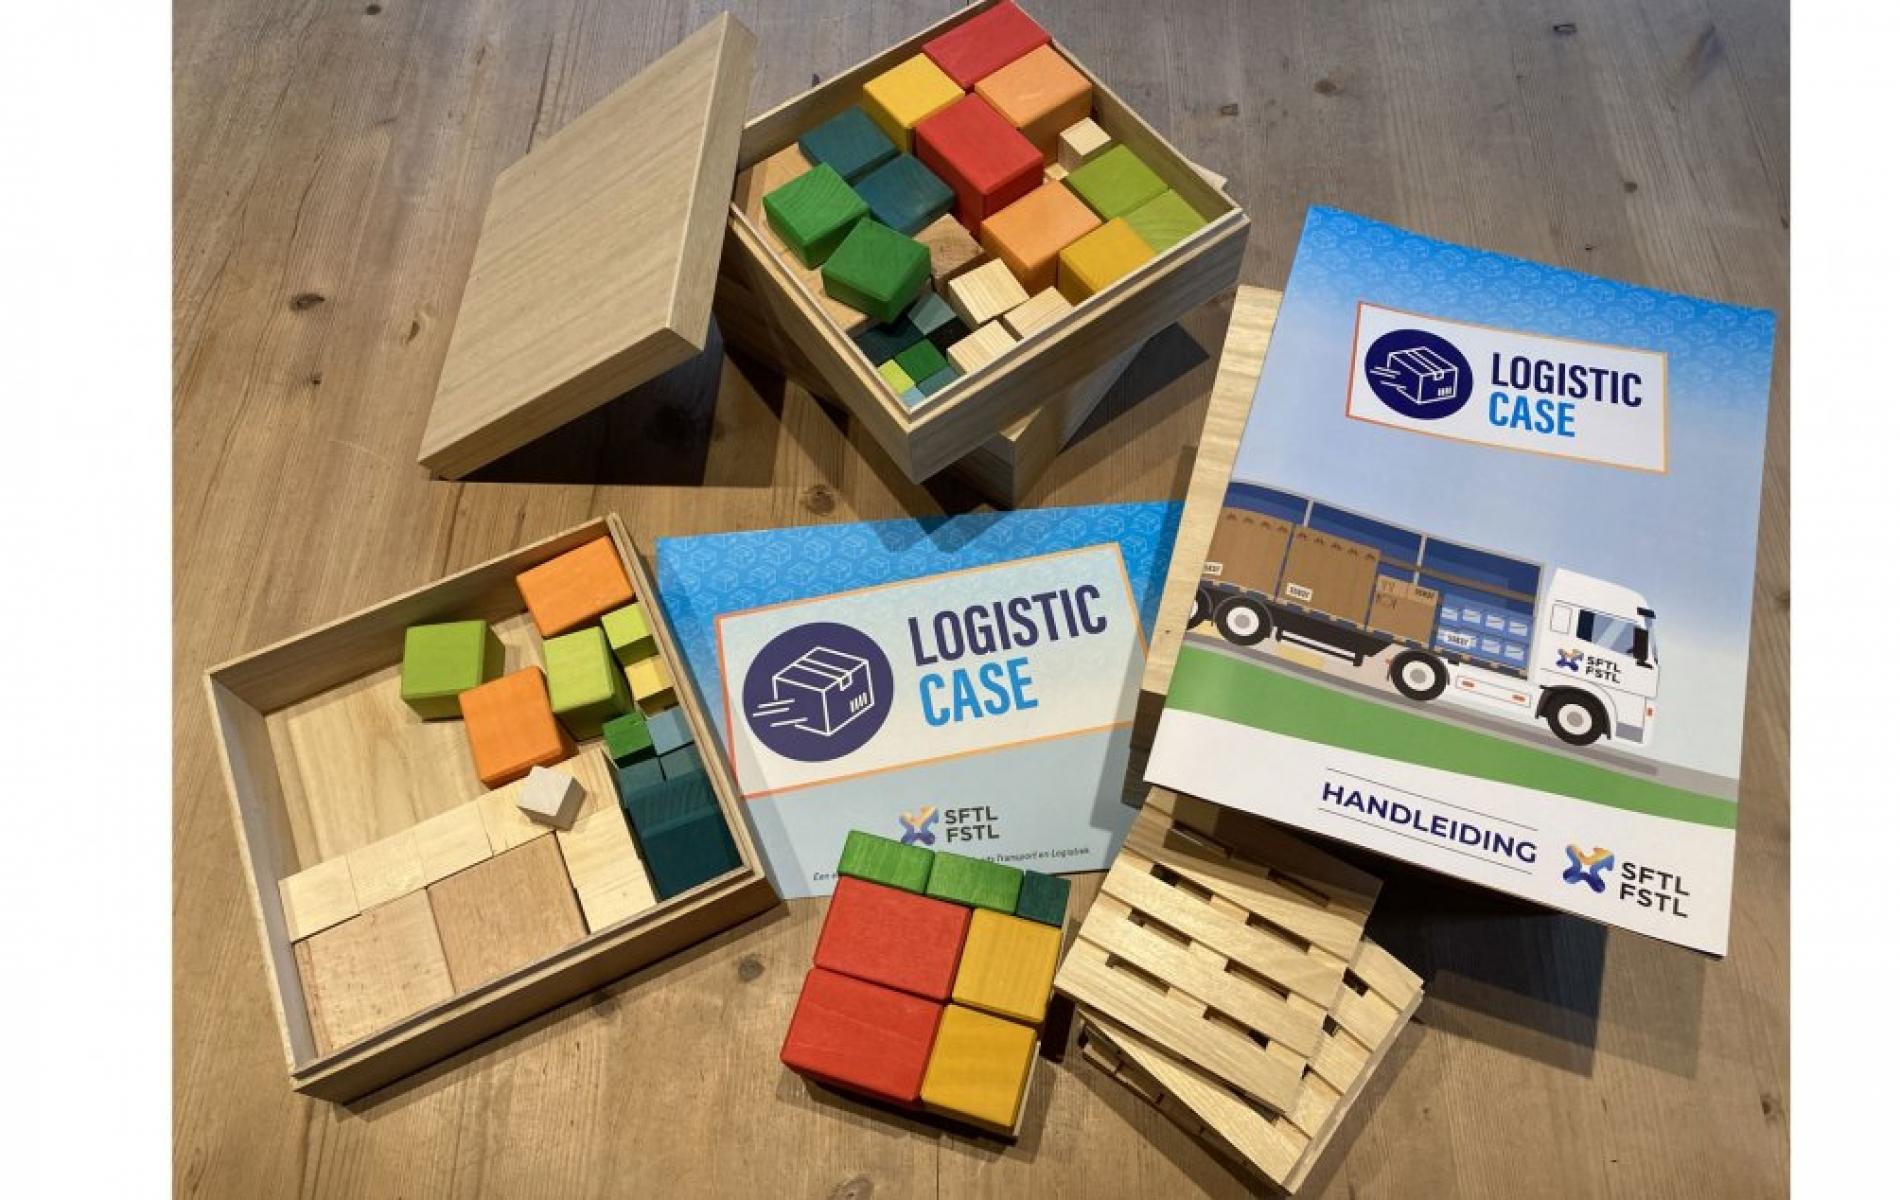 Logistic Case